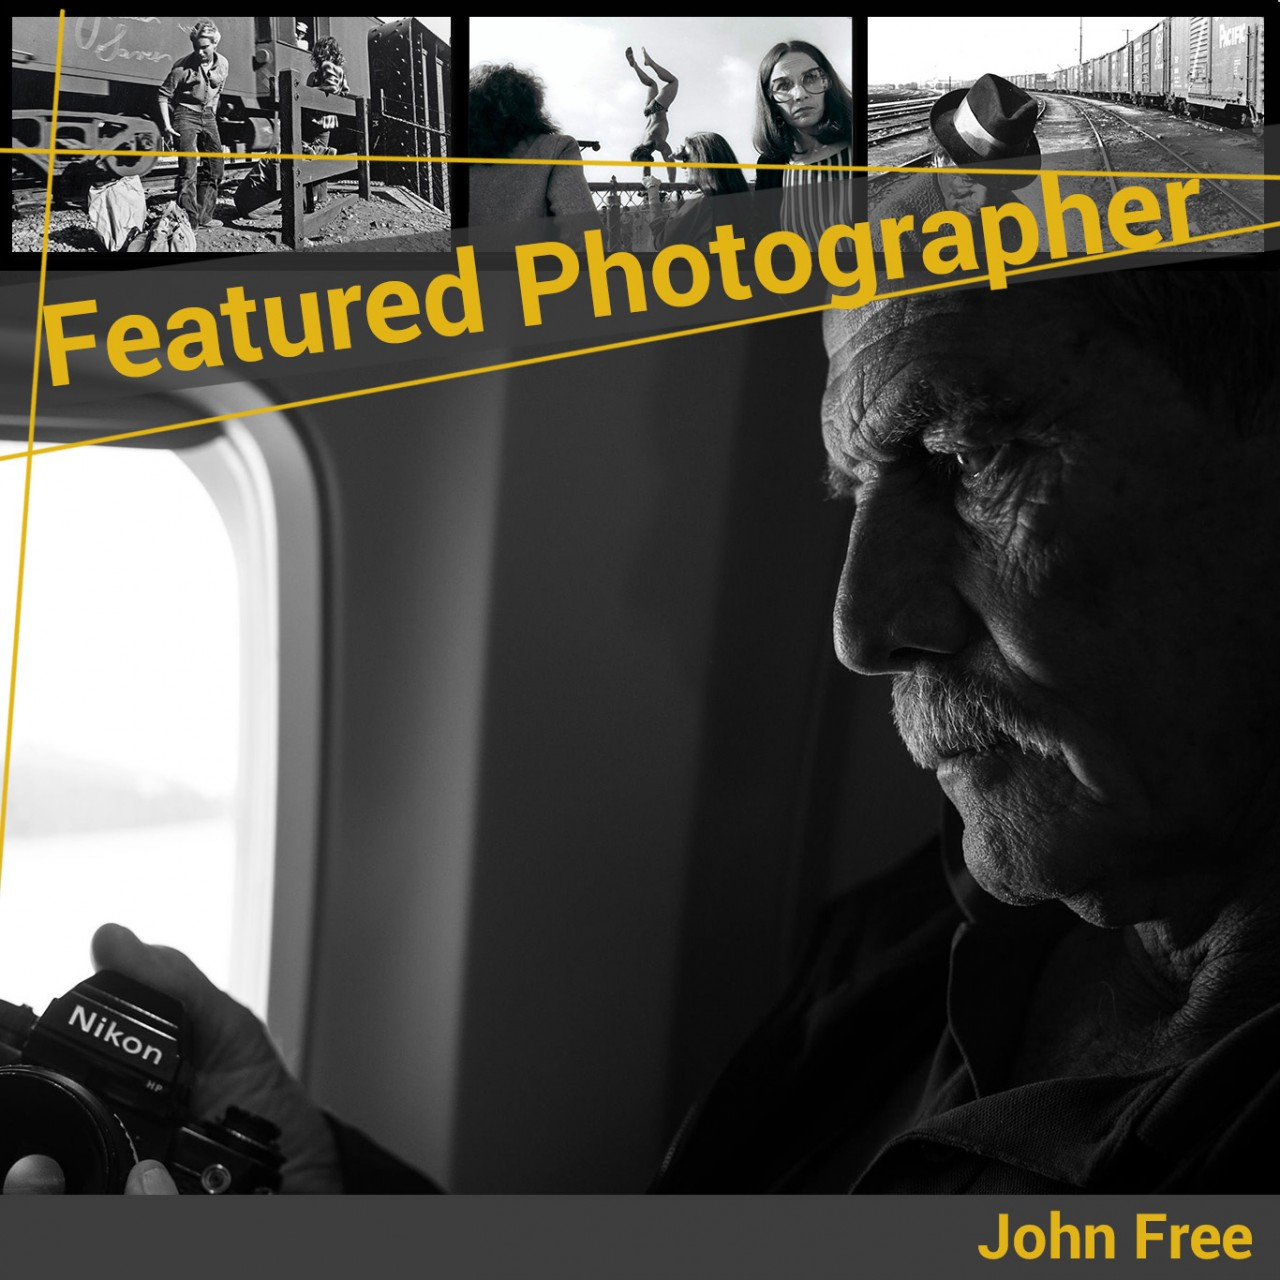 Templatet Featured PhotographerJF